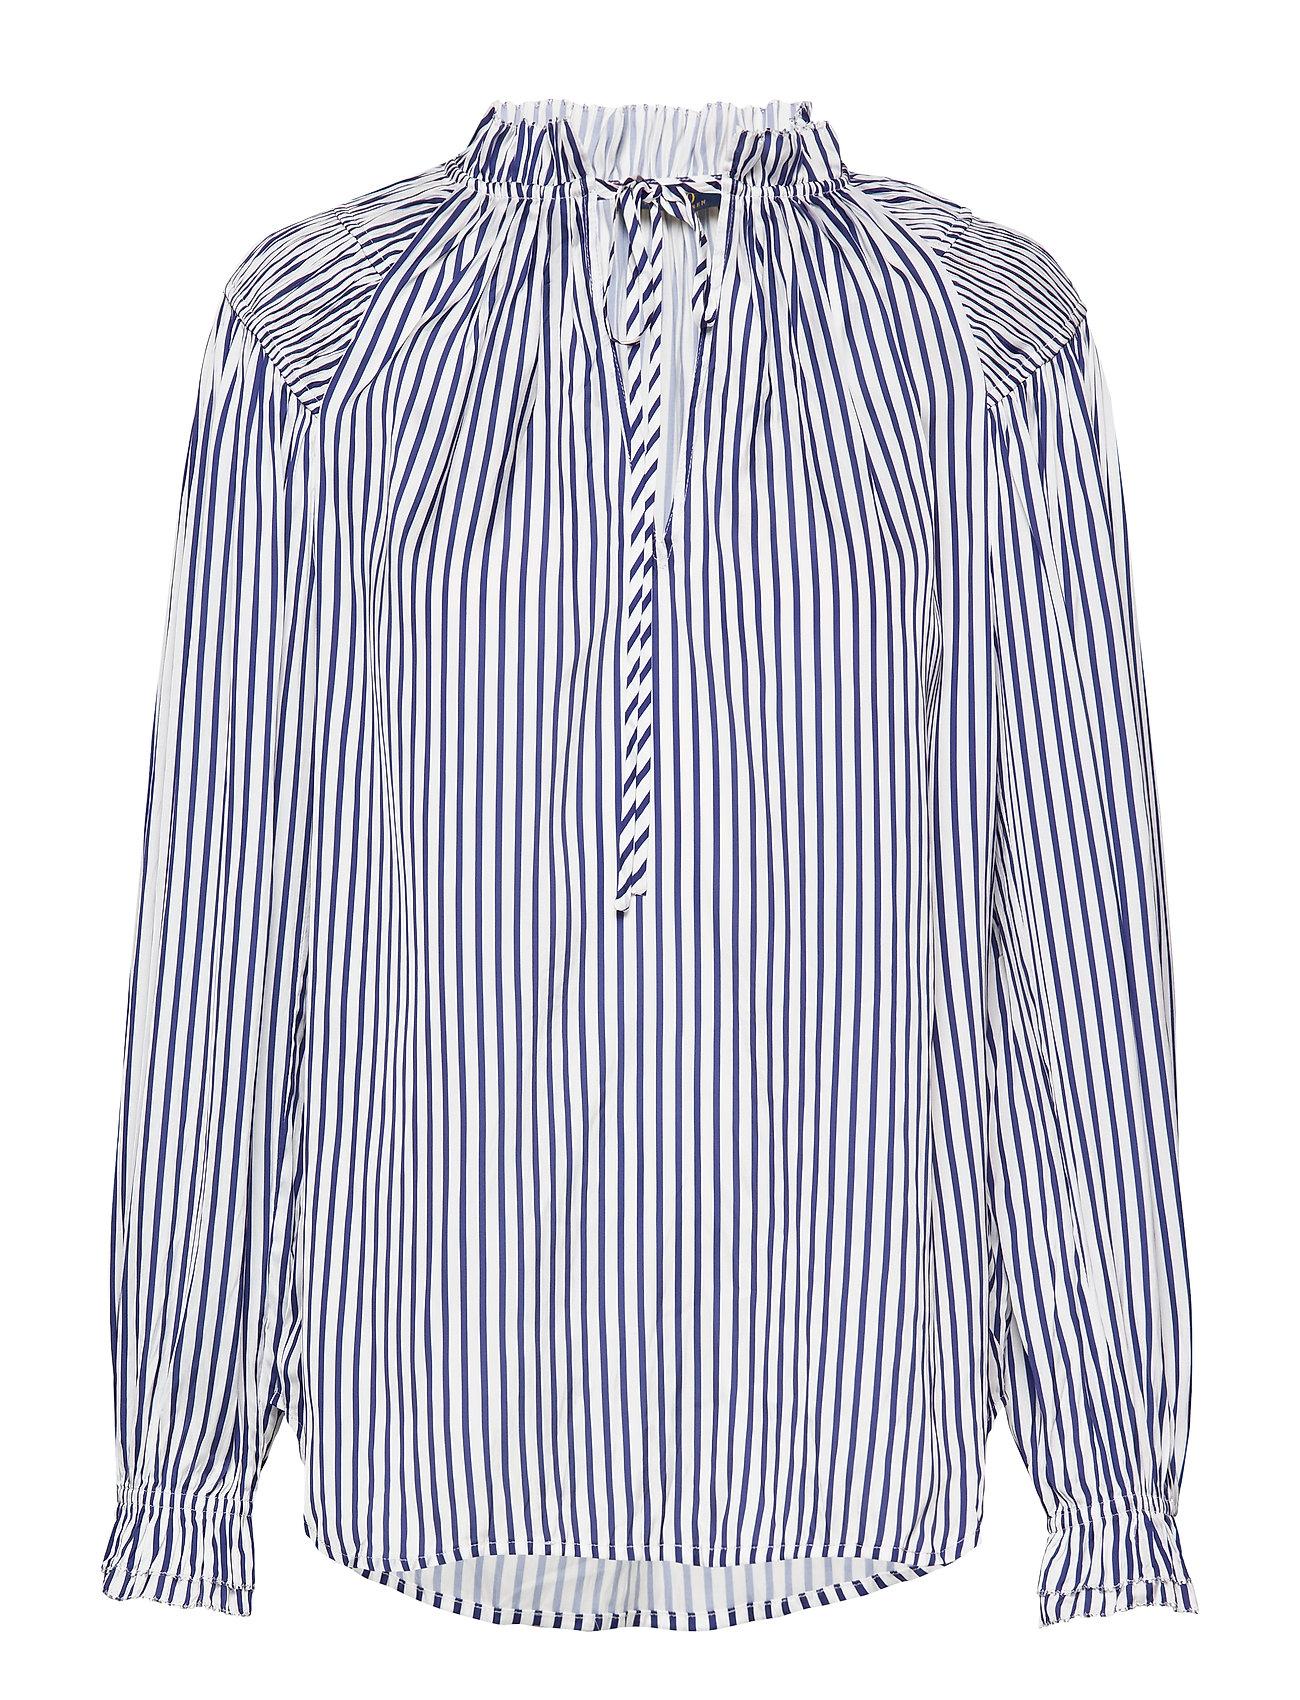 Polo Ralph Lauren Striped Satin Shirt - 523 WHITE/BLUE